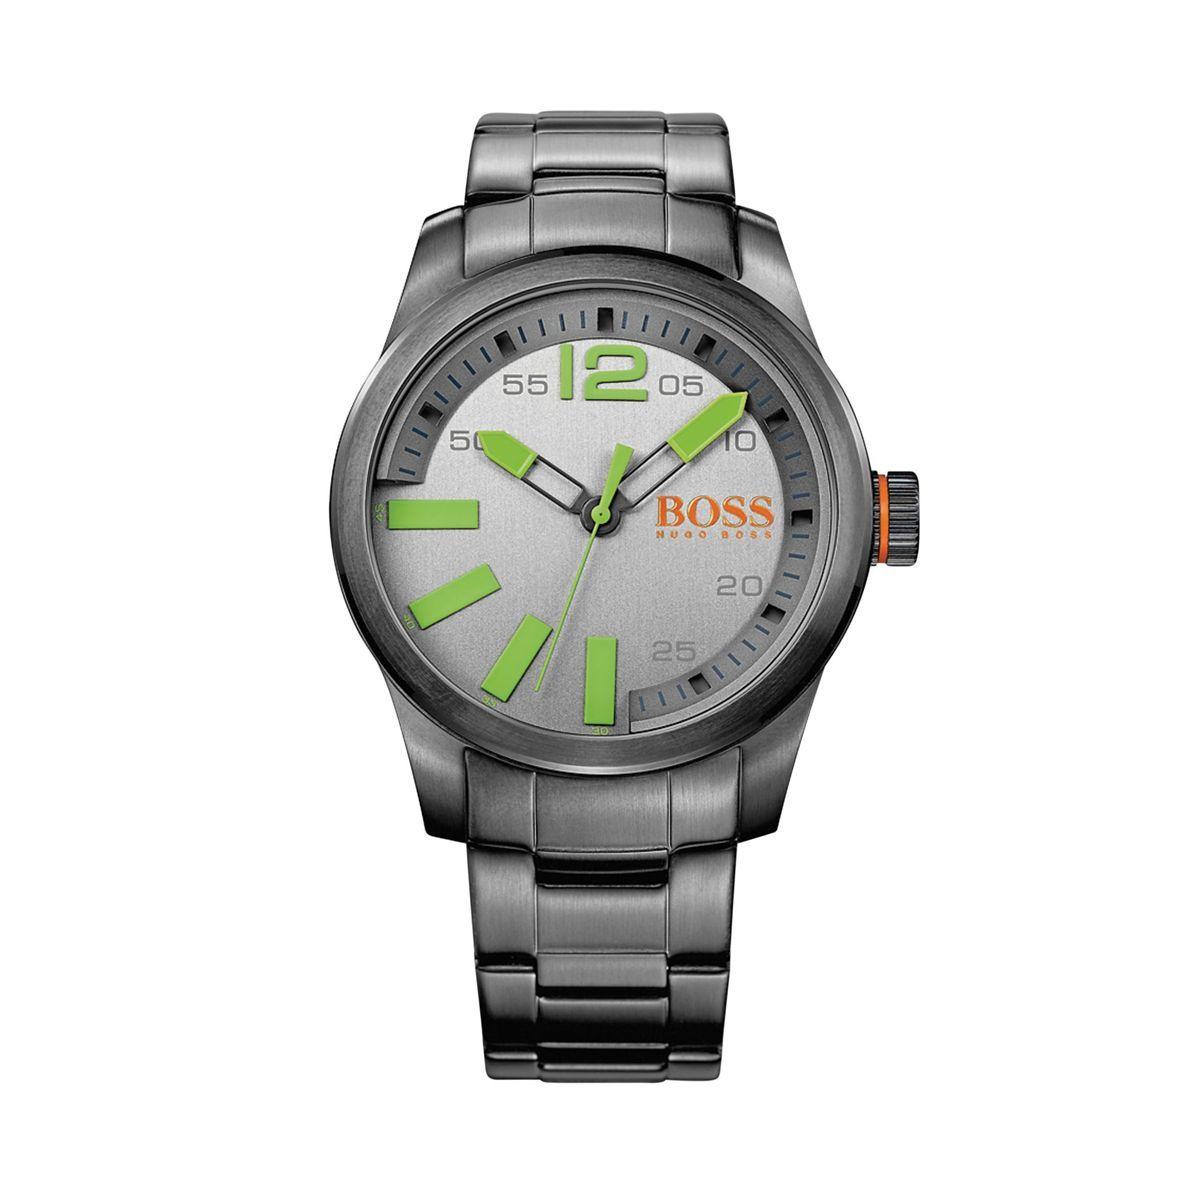 orologio Hugo Boss uomo 1513050 mod Paris